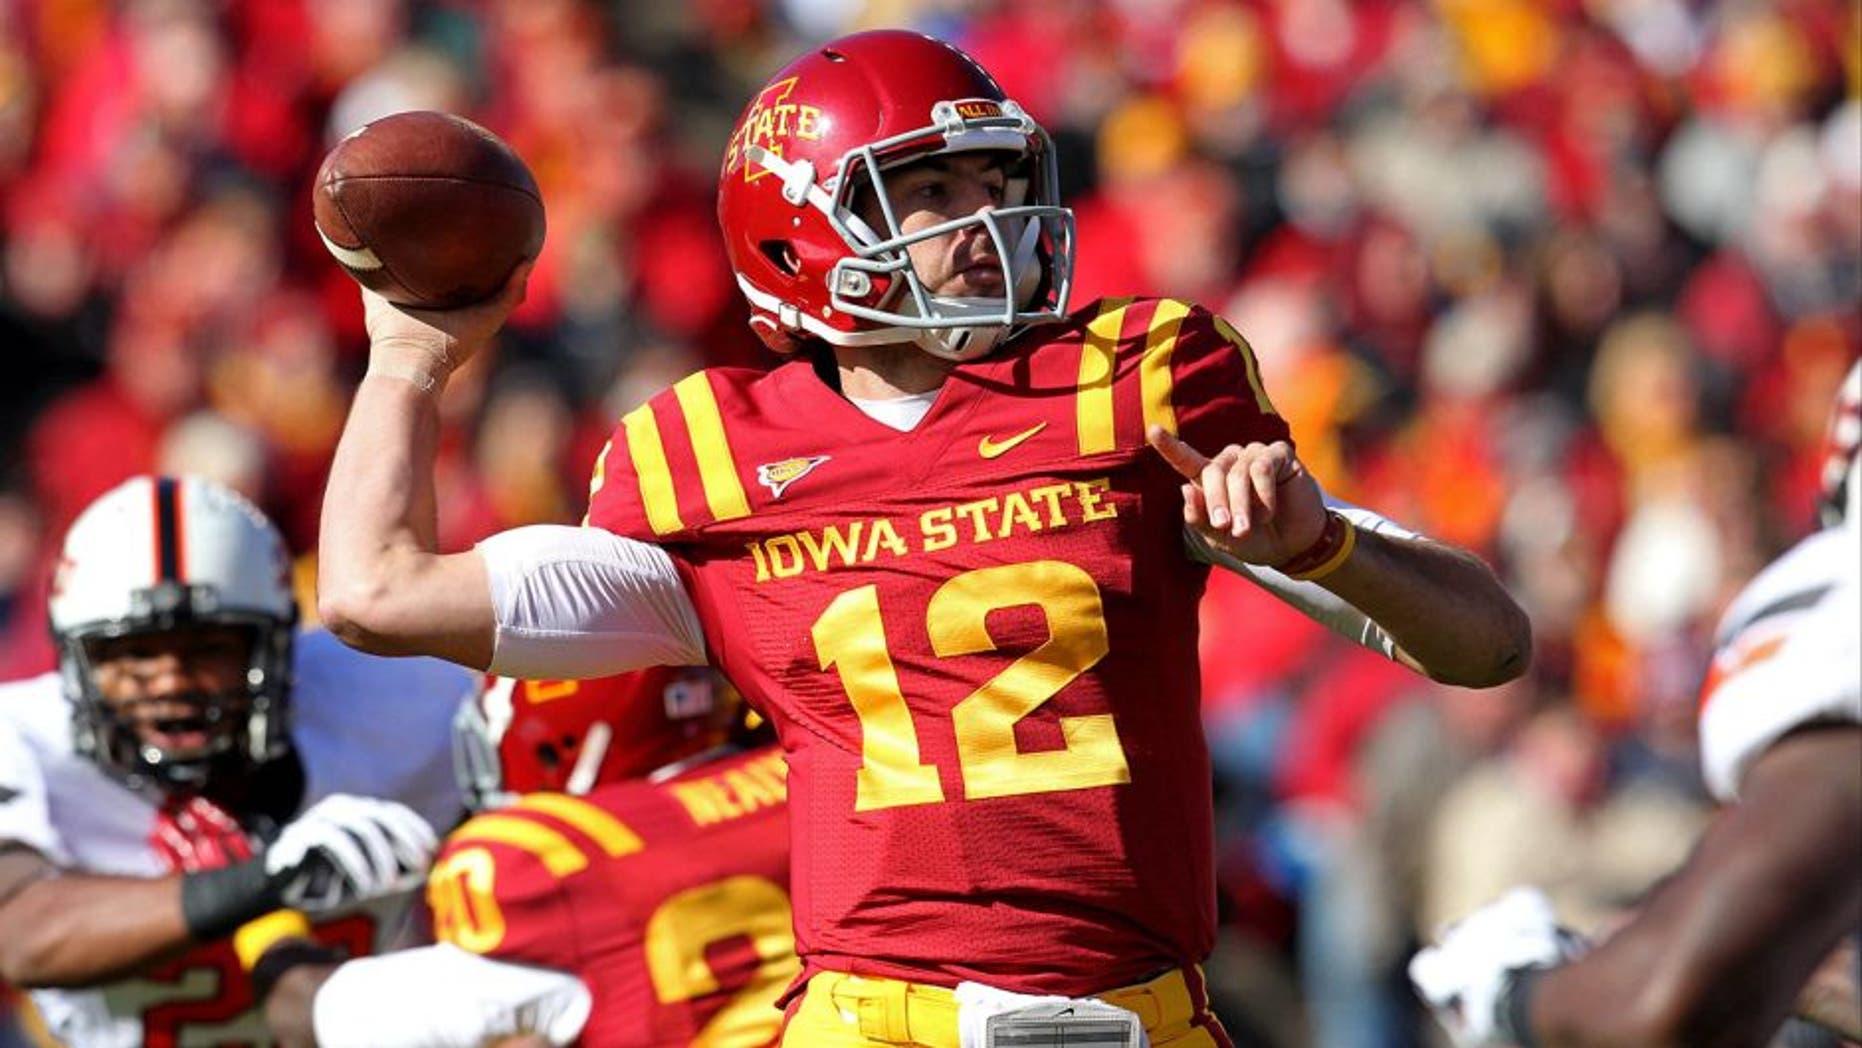 Oct 26, 2013; Ames, IA, USA; Iowa State Cyclones quarterback Sam B. Richardson (12) throws during the first quarter against the Oklahoma State Cowboys at Jack Trice Stadium. Mandatory Credit: Brace Hemmelgarn-USA TODAY Sports